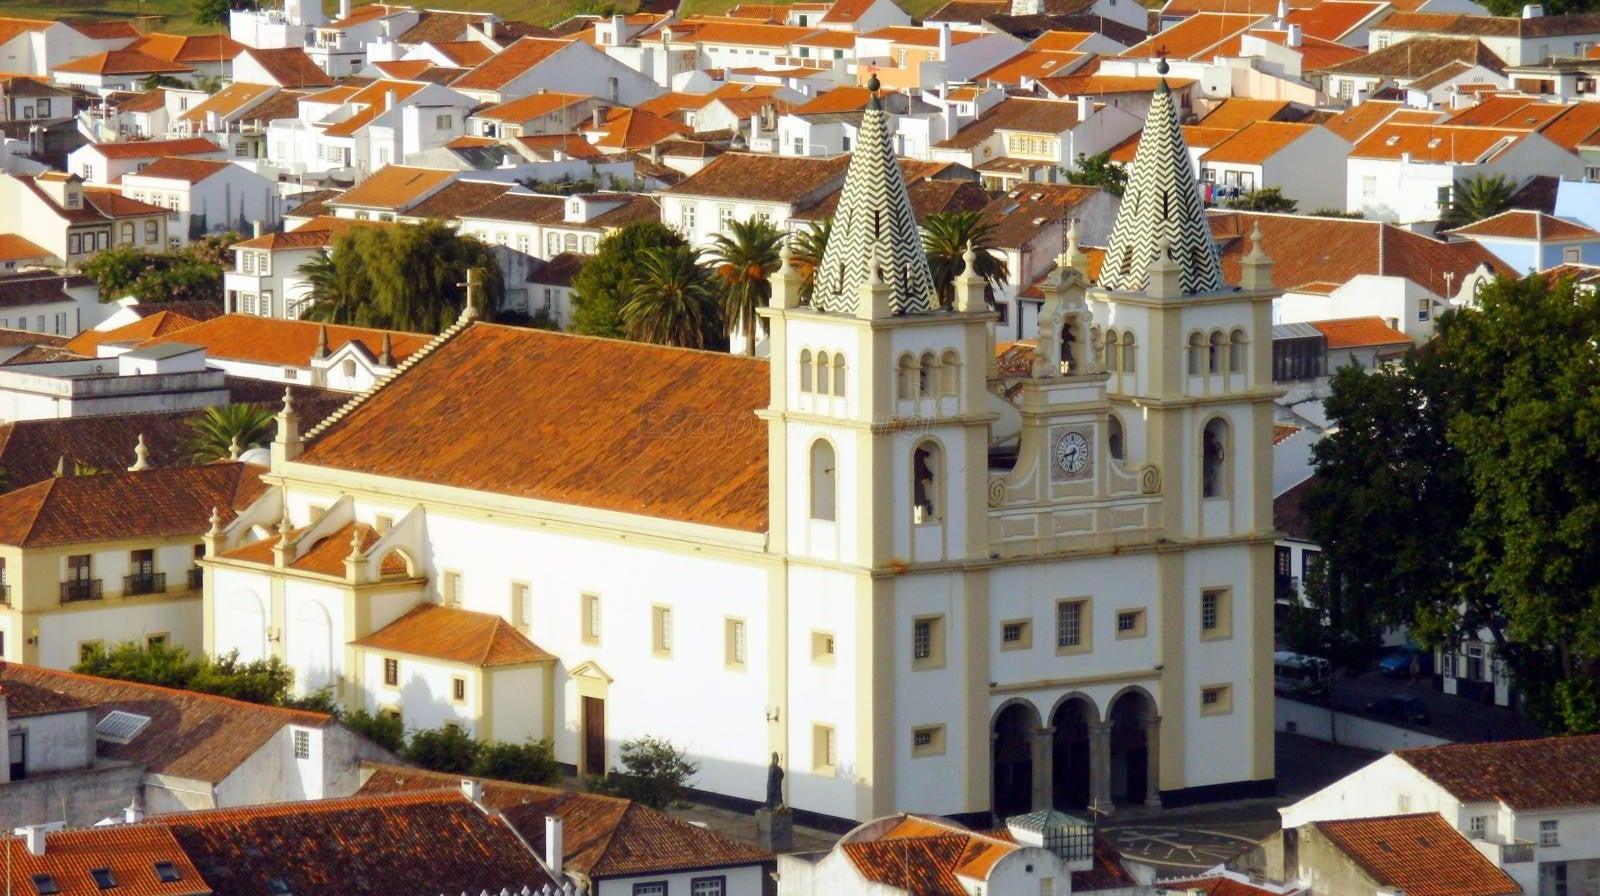 Eucaristia Dominical - Açores (Sé de Angra)